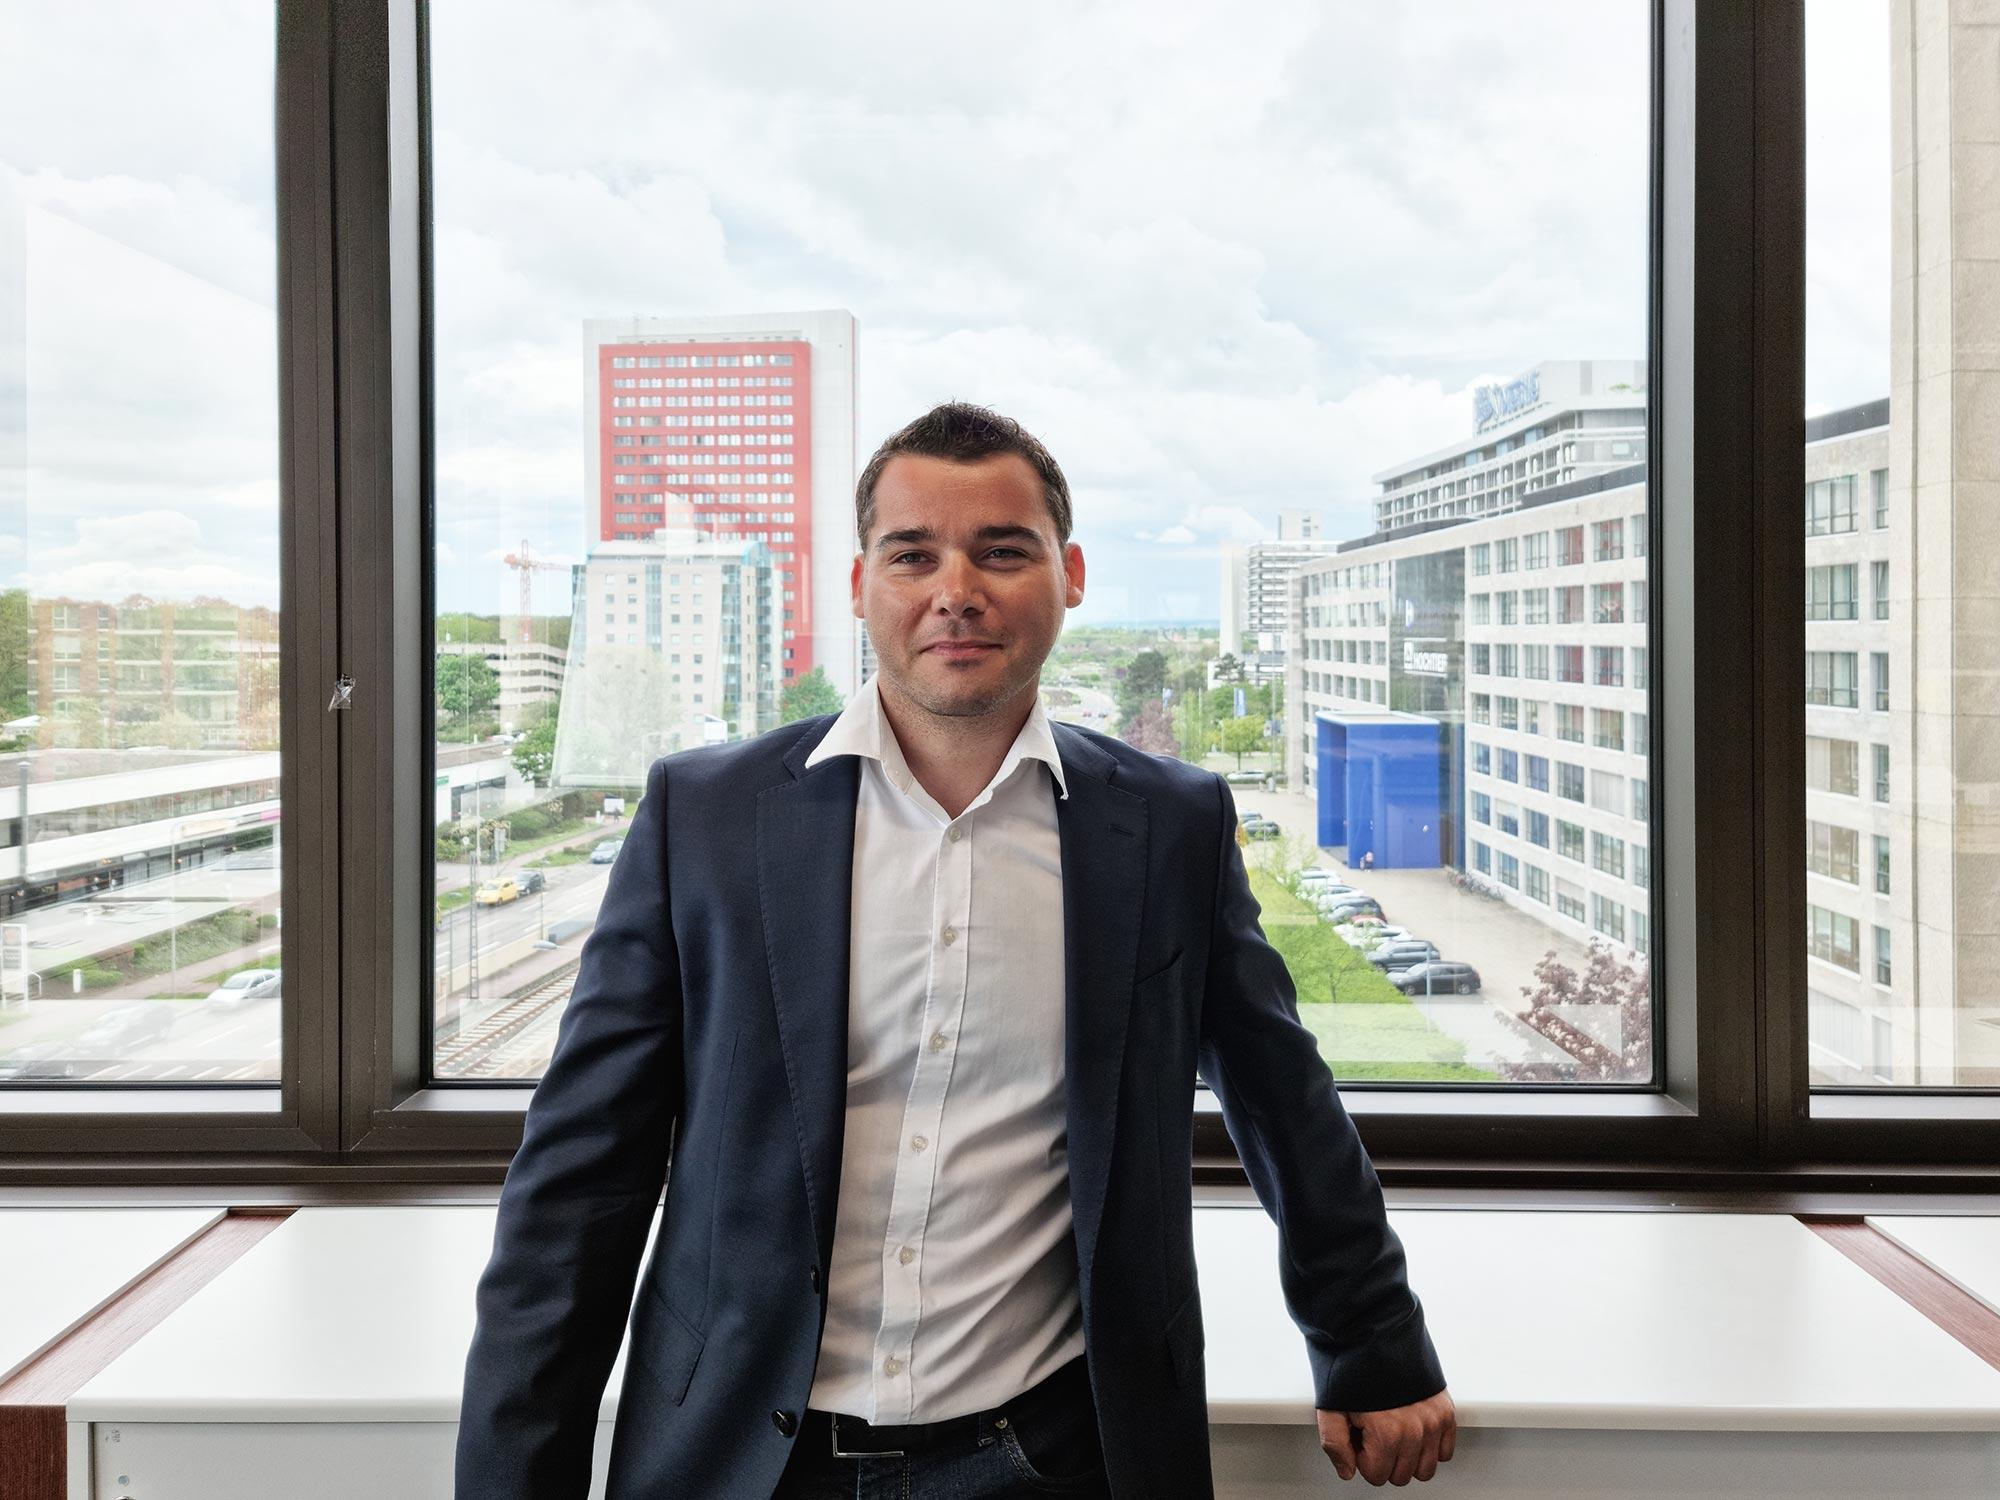 Marco Verardi - Siemens Frankfurt - Gebäudetechnik Consulant - Smart Buildings Frankfurt